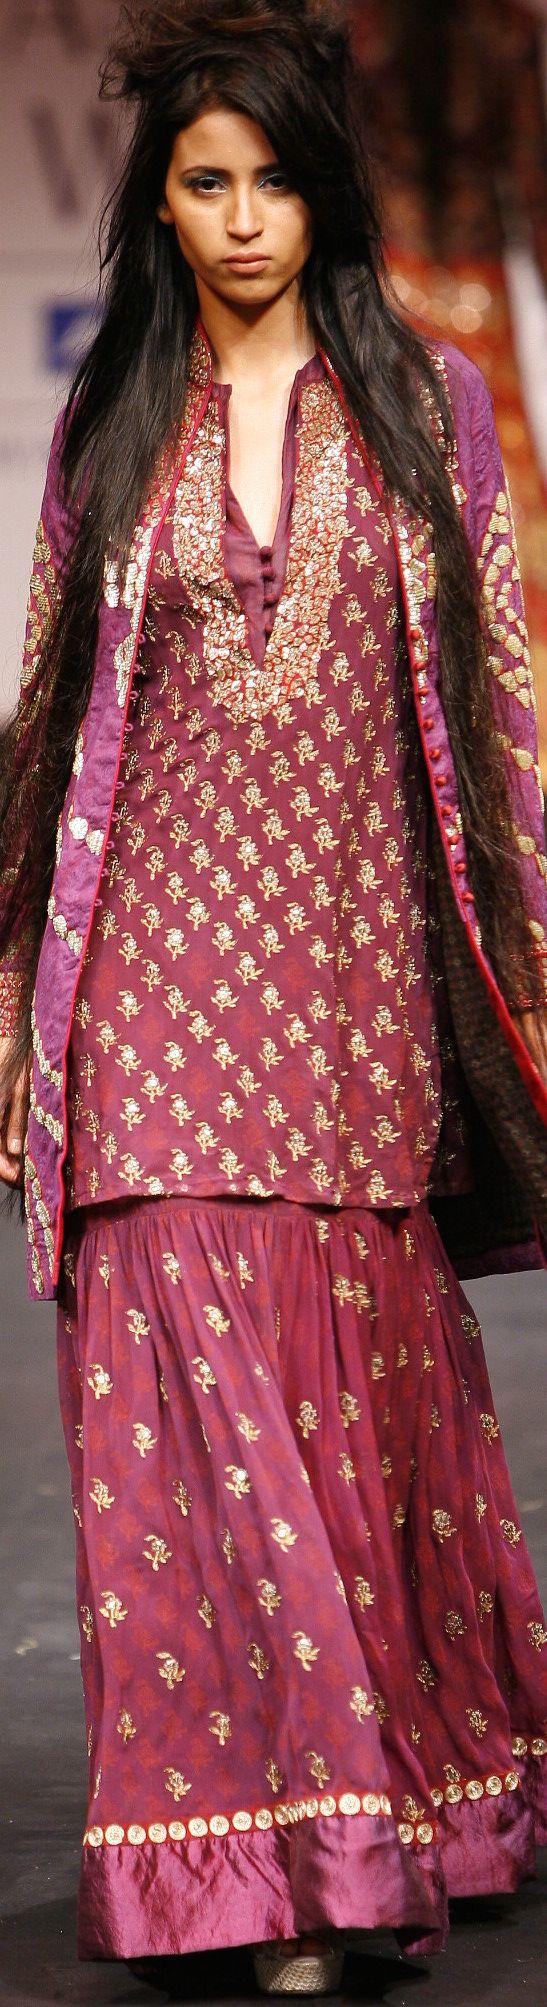 Krishna Mehta A/W 2010 Collection - Original pin by @webjournal